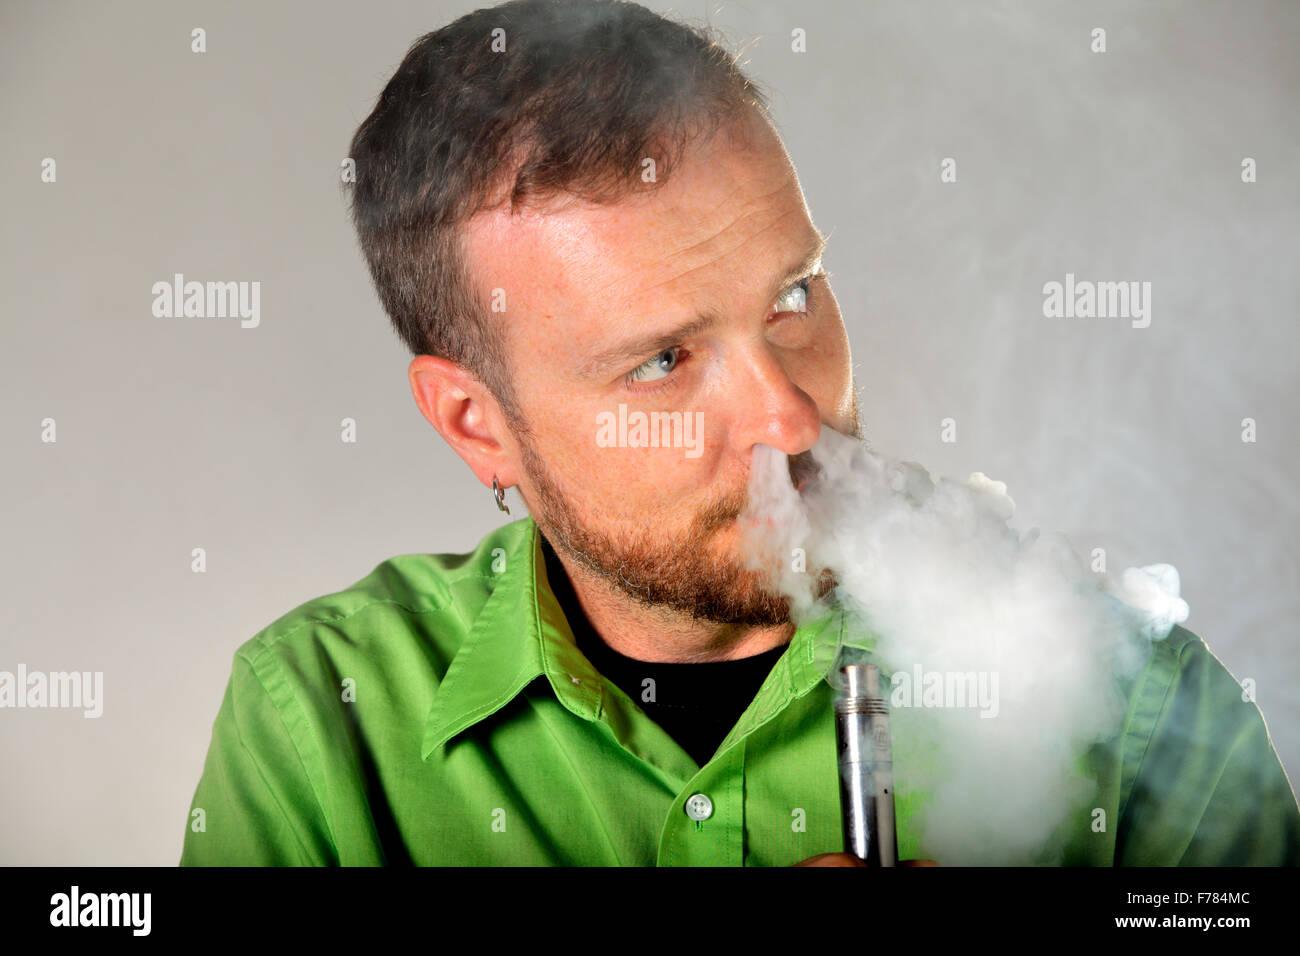 A man using a Tobh atty atomizer e-cigarette. - Stock Image